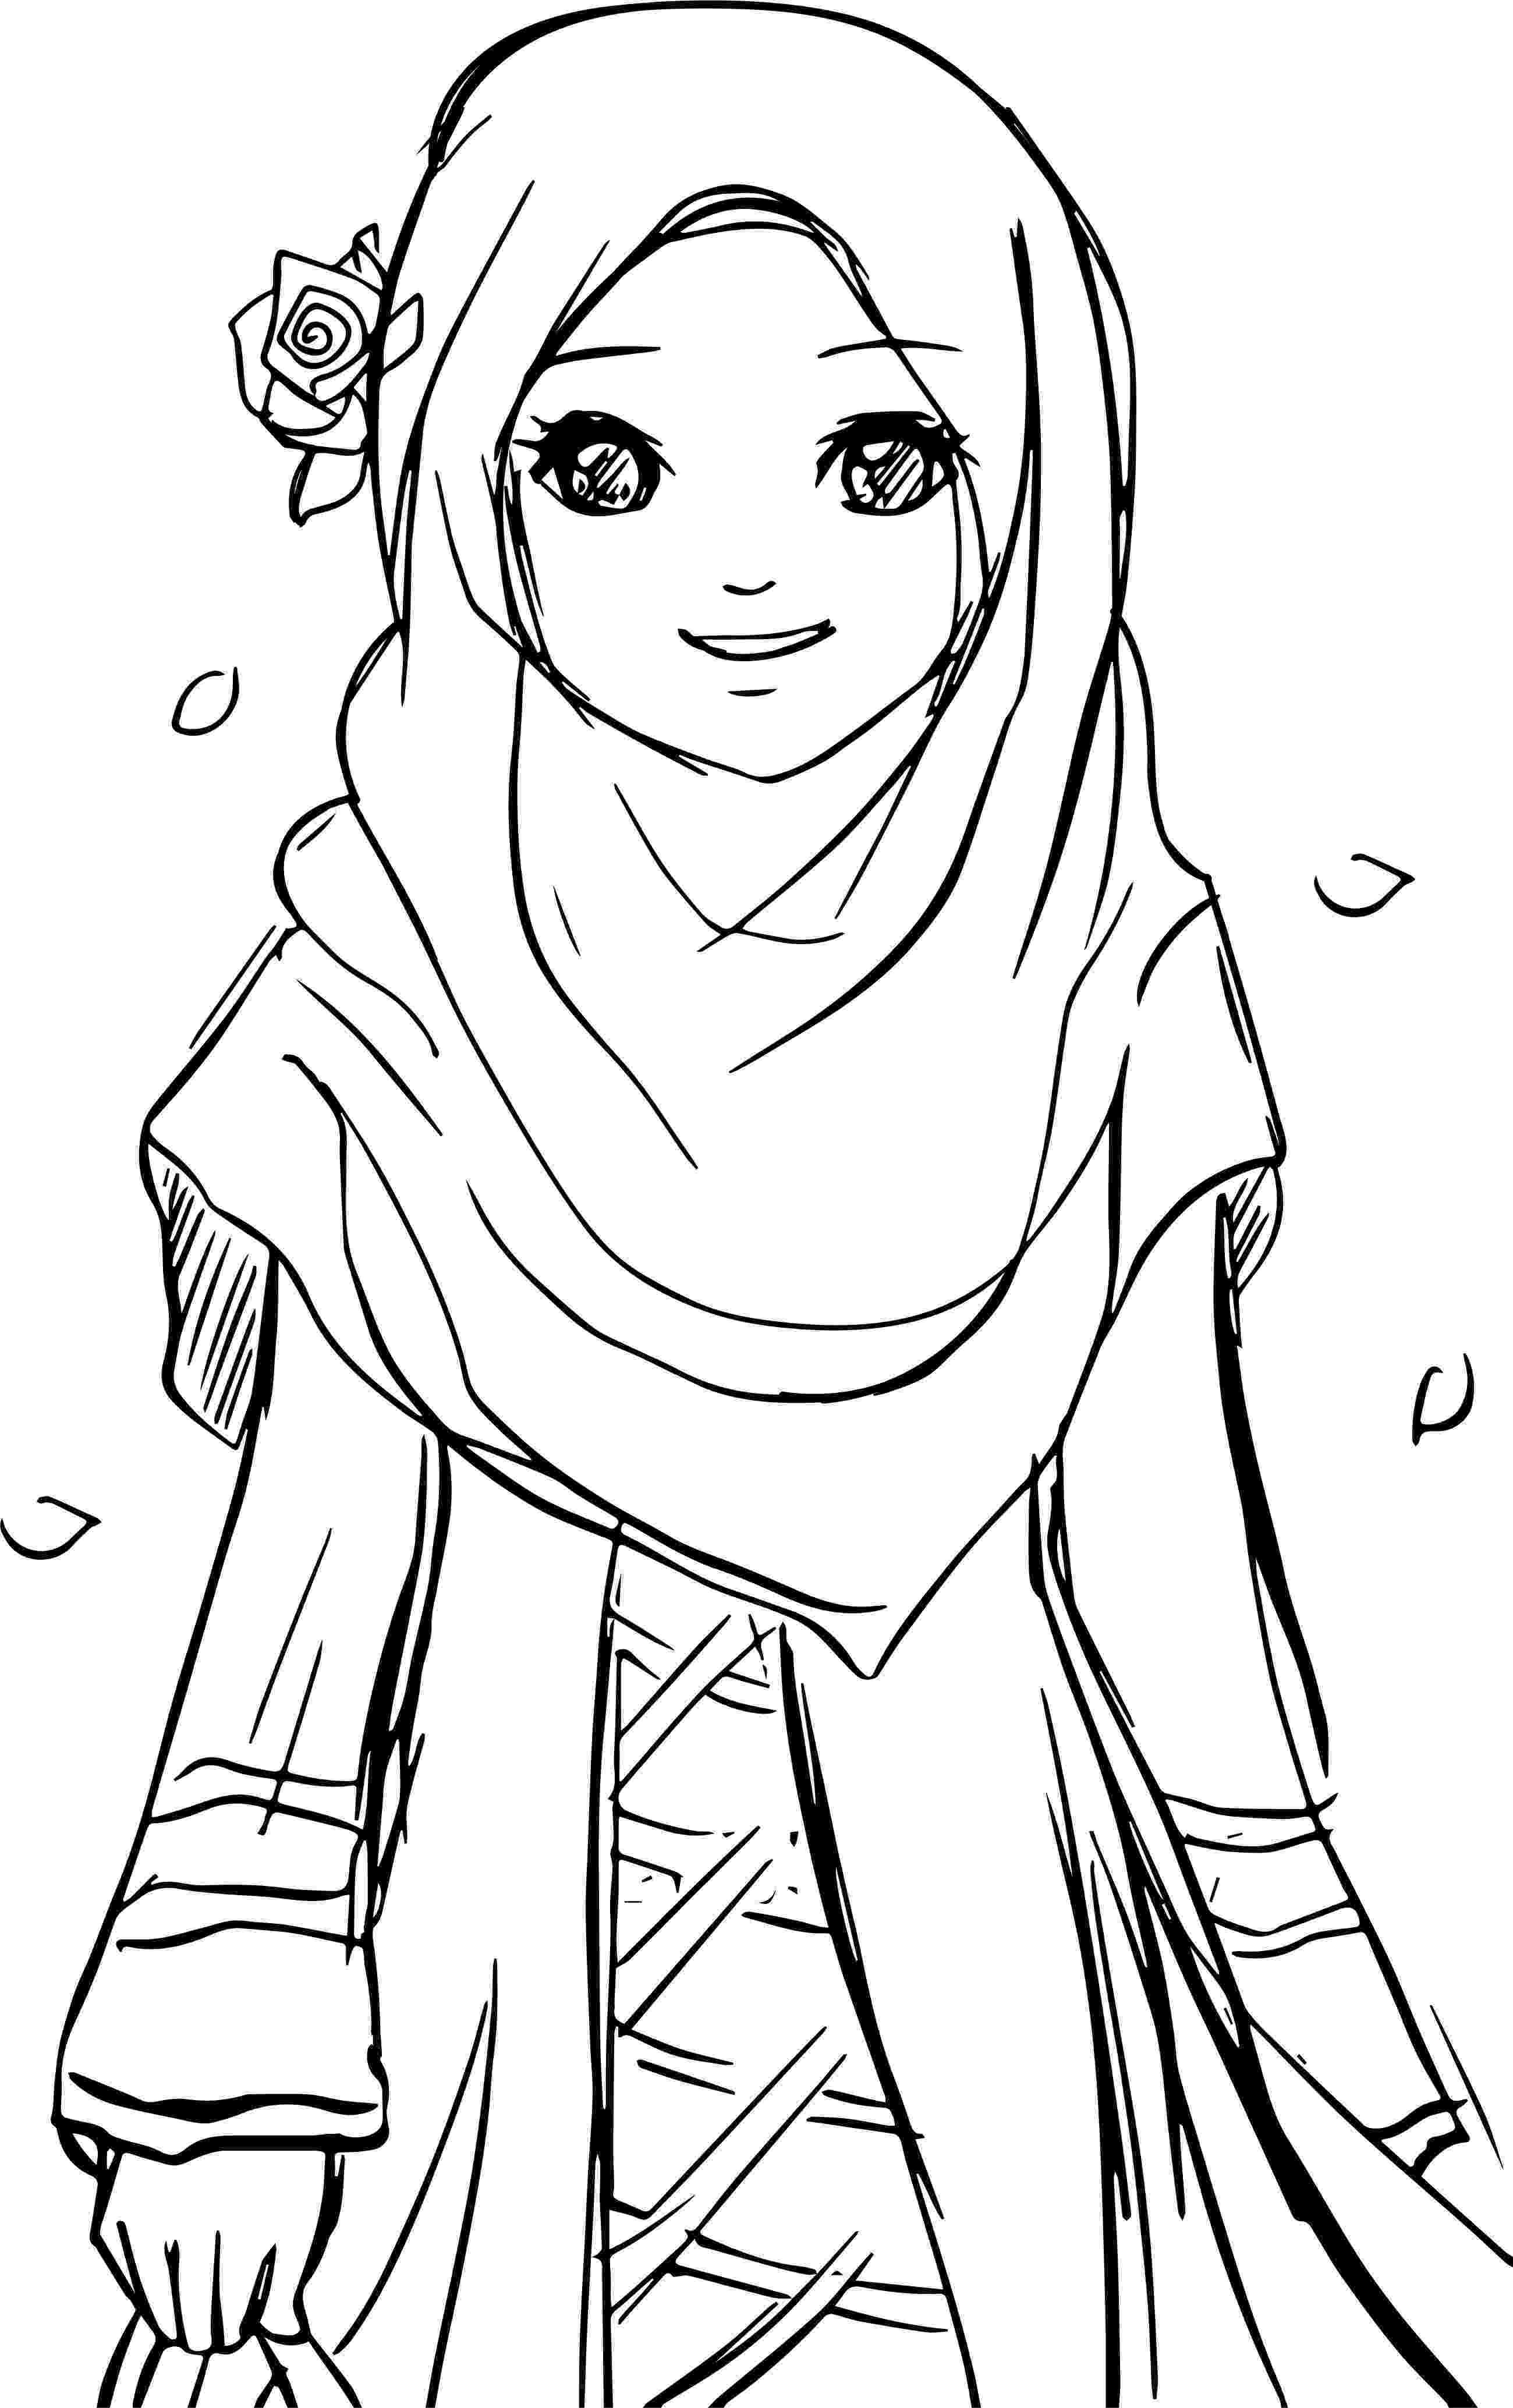 girl coloring books cool islamic muslim wears hijab girl coloring pages girl books coloring